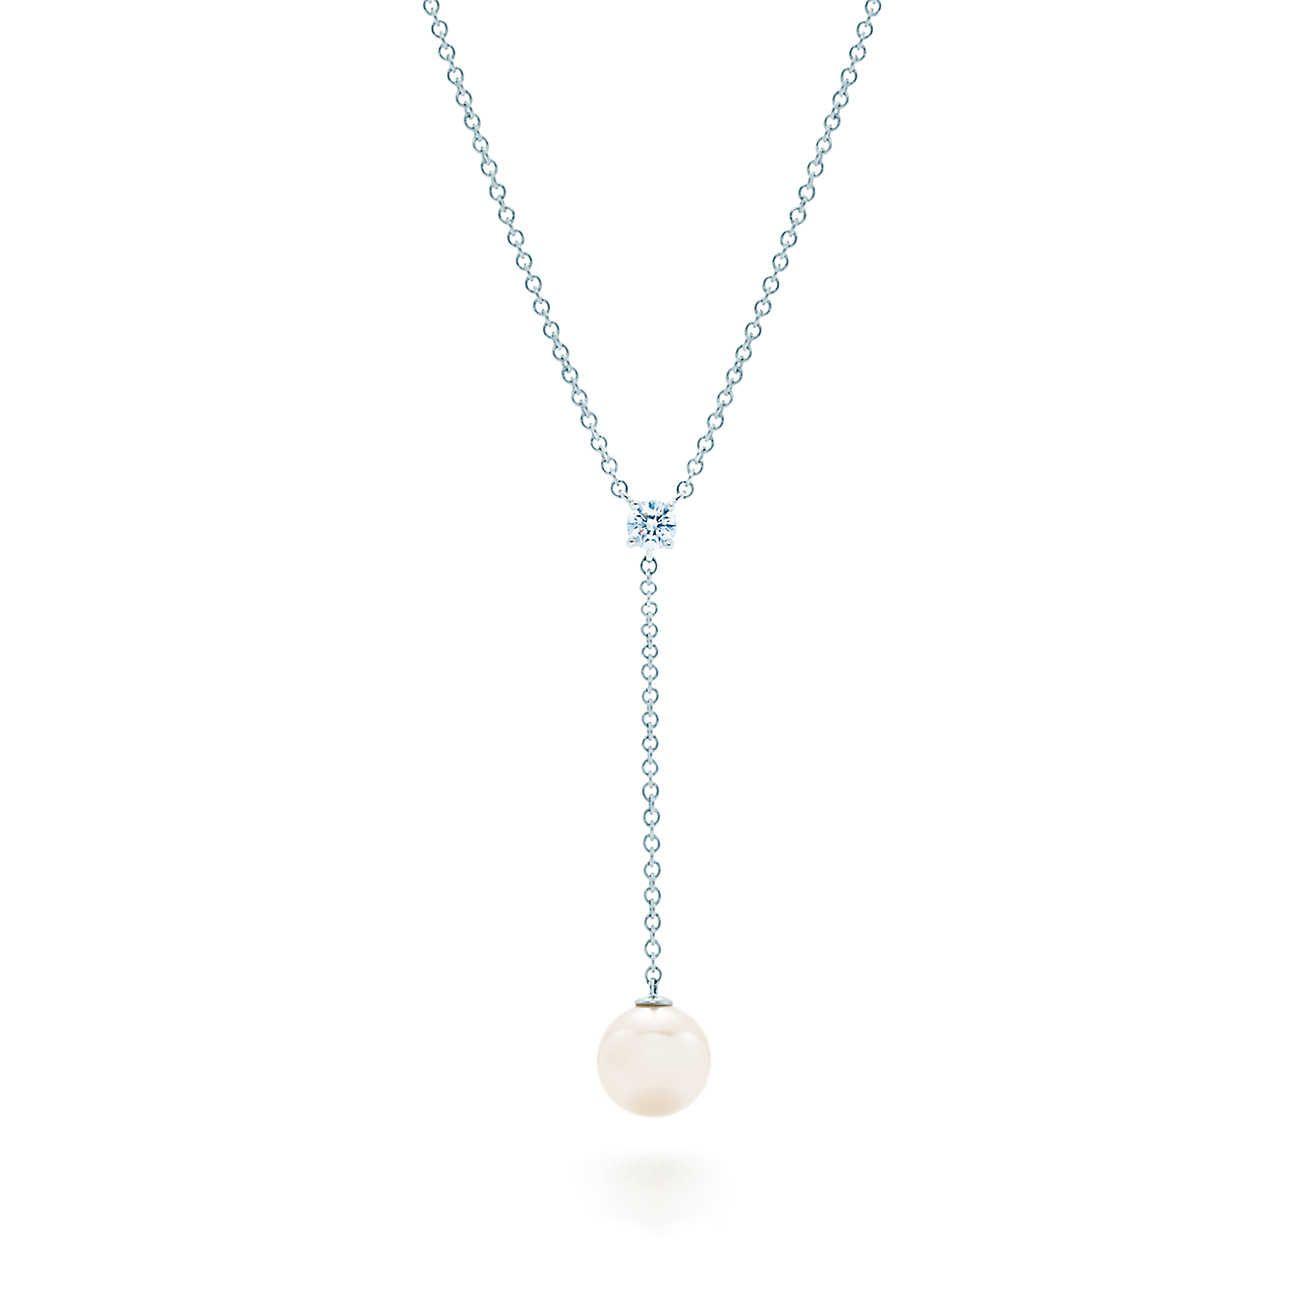 Tiffany signature drop pendant tiffany pendants and drop tiffany signature drop pendant mozeypictures Gallery